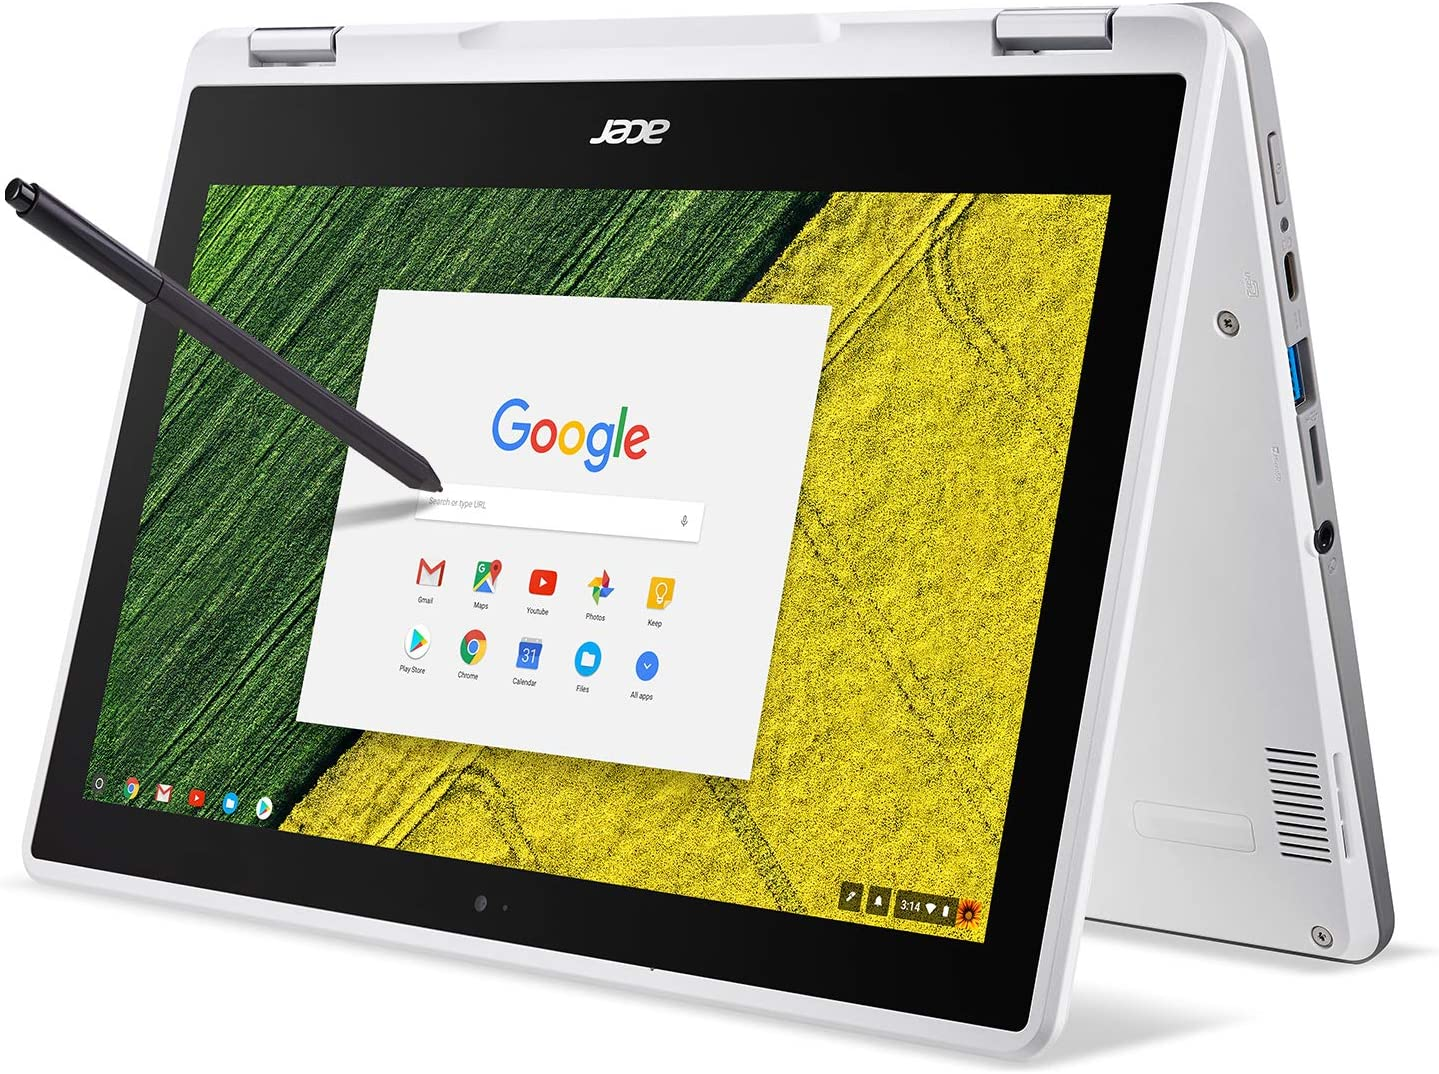 Acer Chromebook Spin 11 Convertible Celeron San Antonio Mall N3350 11.6 Laptop Miami Mall